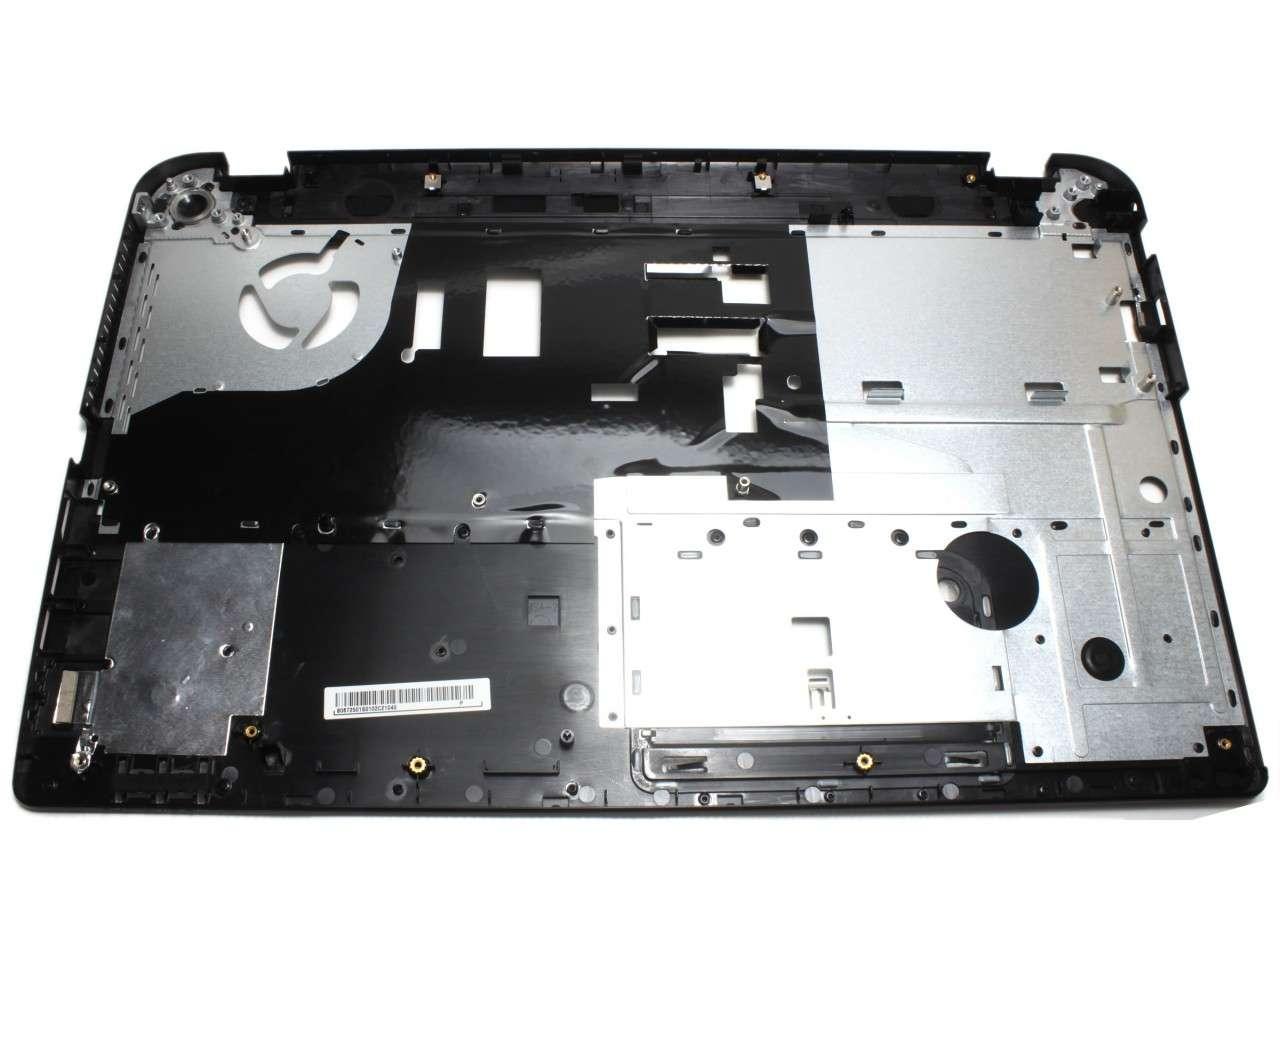 Palmrest Toshiba Satellite S50DT A Gri Negru fara touchpad Refurbished imagine powerlaptop.ro 2021